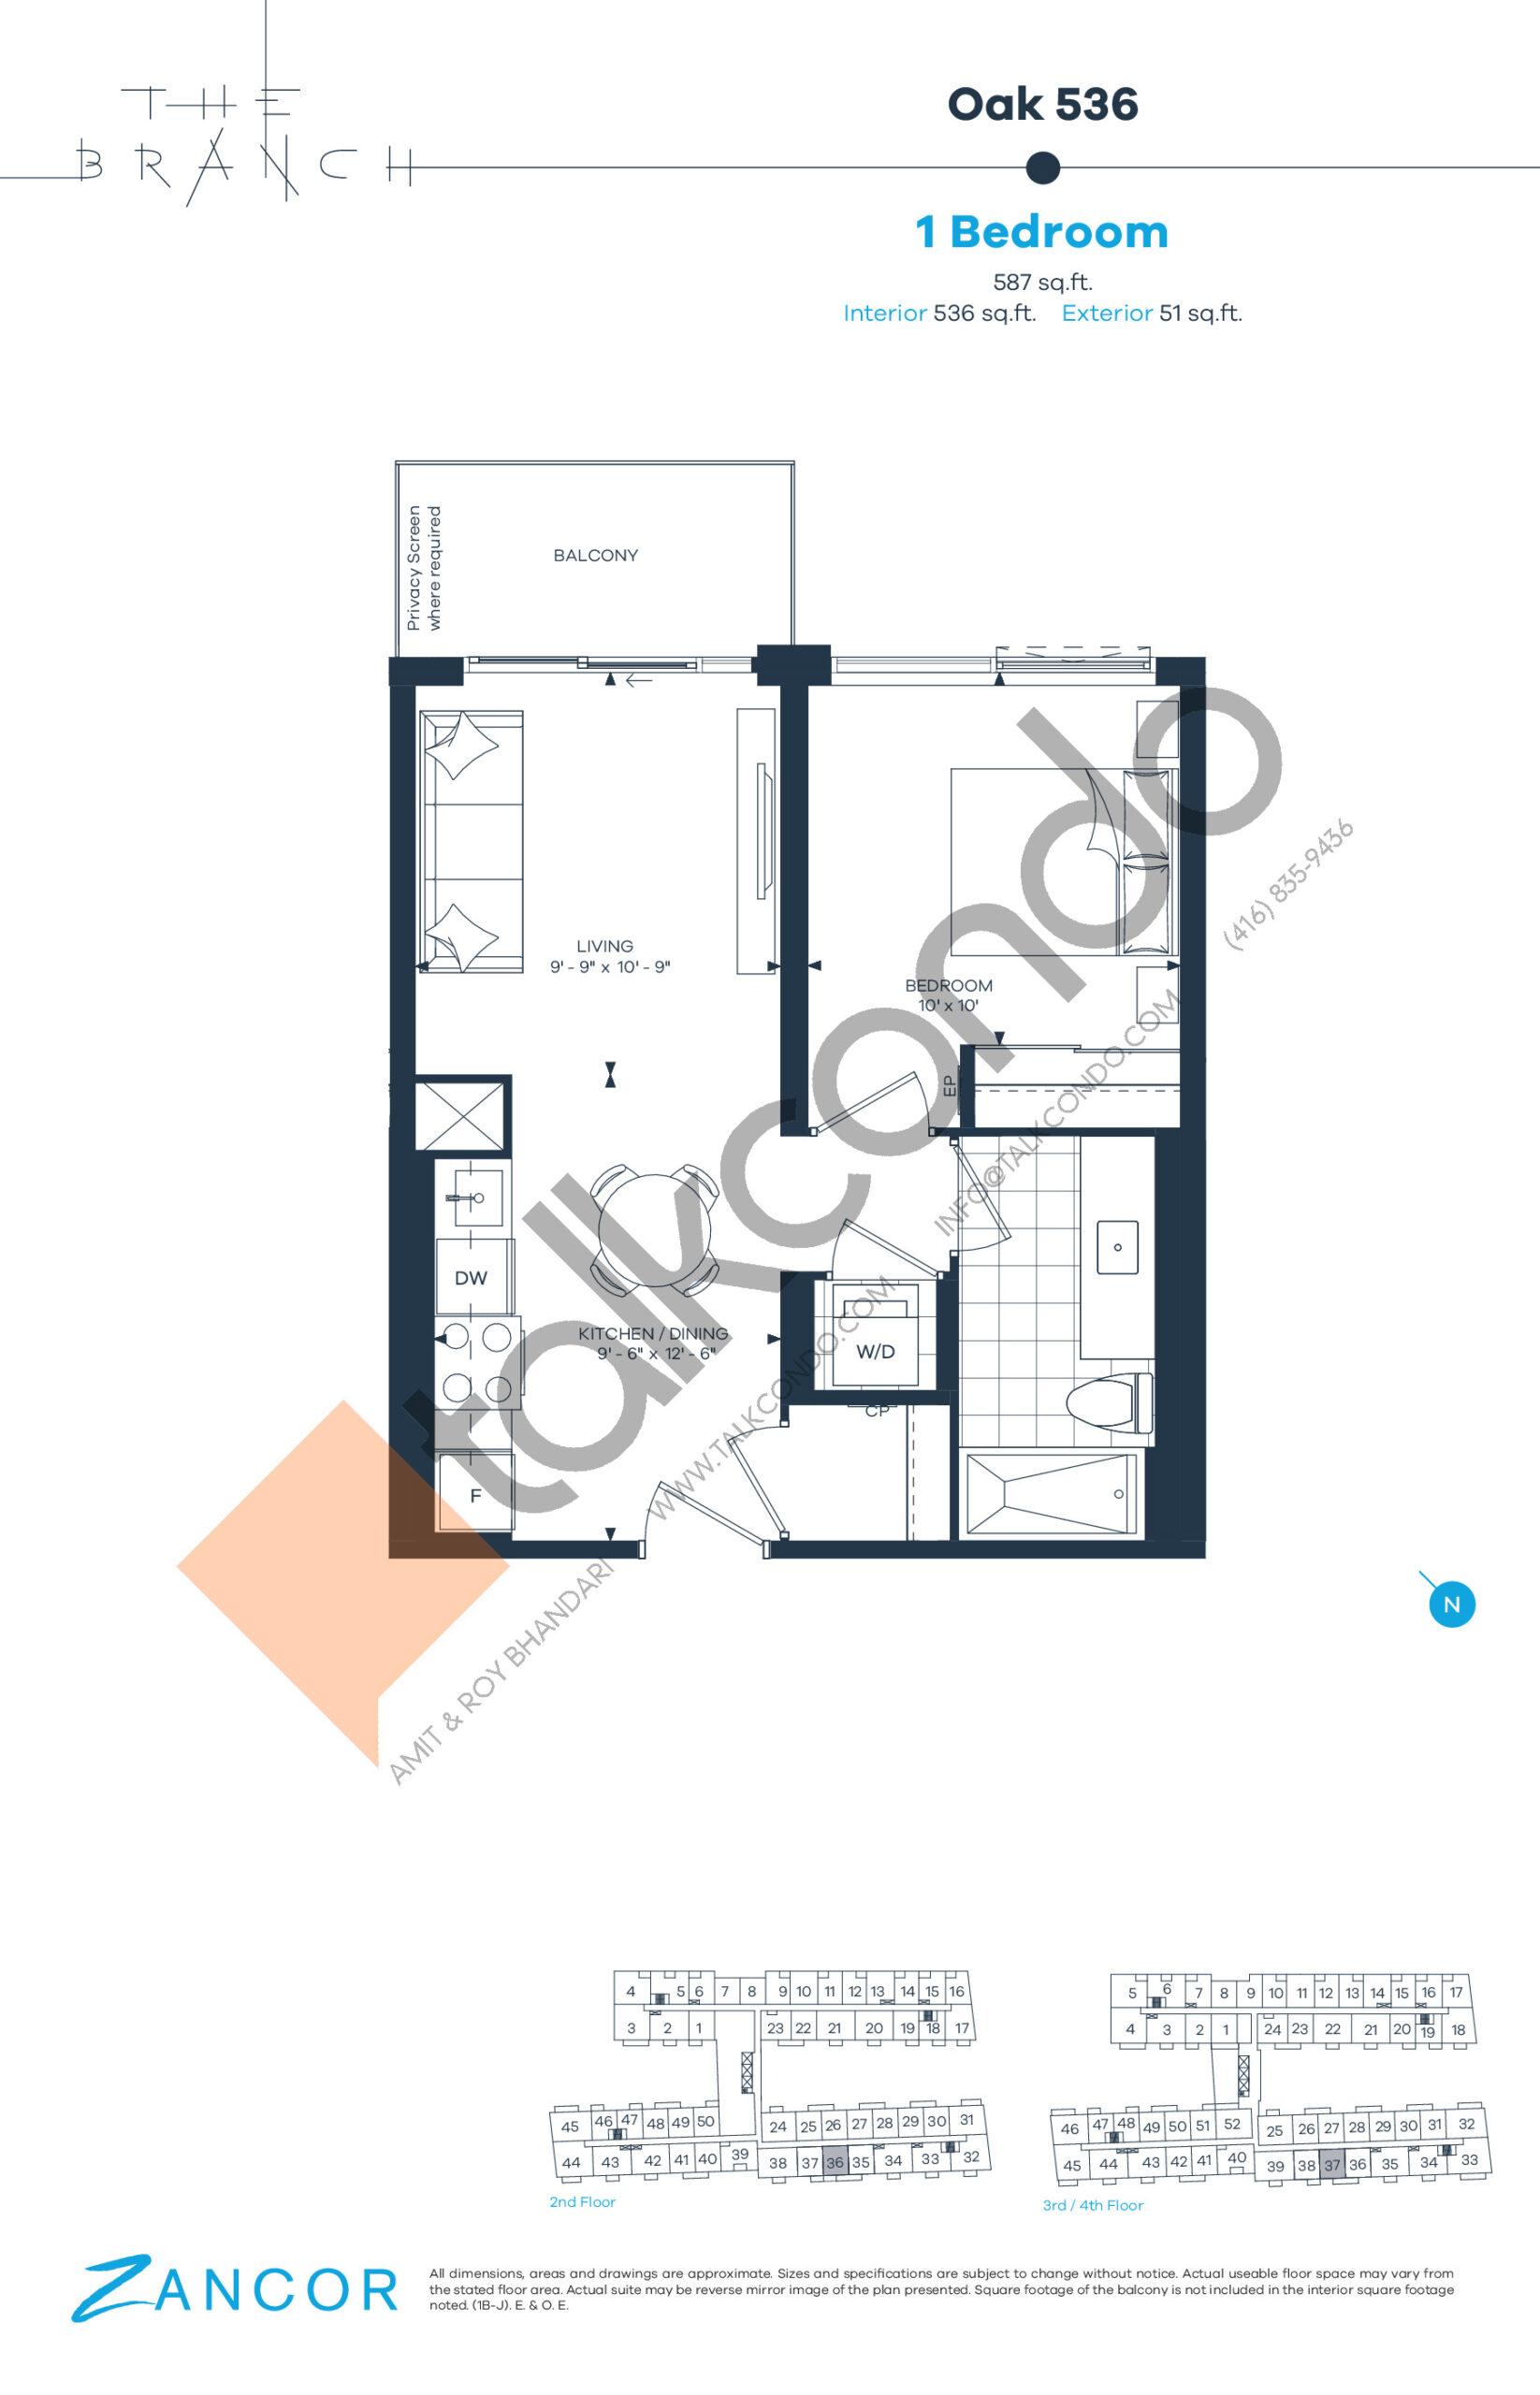 Oak 536 Floor Plan at The Branch Condos - 536 sq.ft